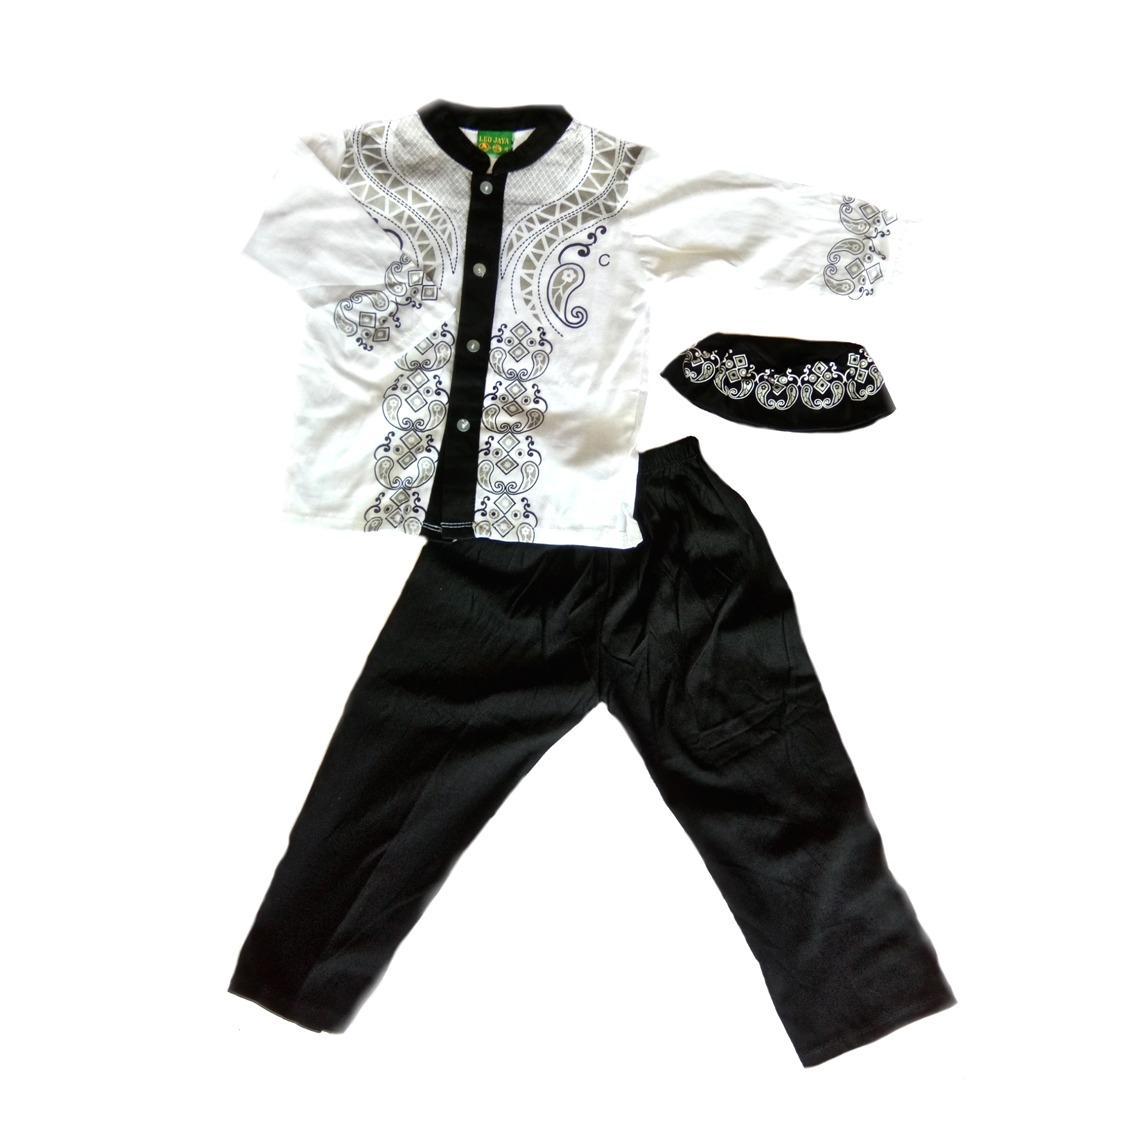 Baju Koko Zhafir Bayi dan Anak New - Baju Koko Bayi Baju Setelan Muslim Anak Laki - Laki Baju Set Anak Laki Laki - Warna Random / Acak